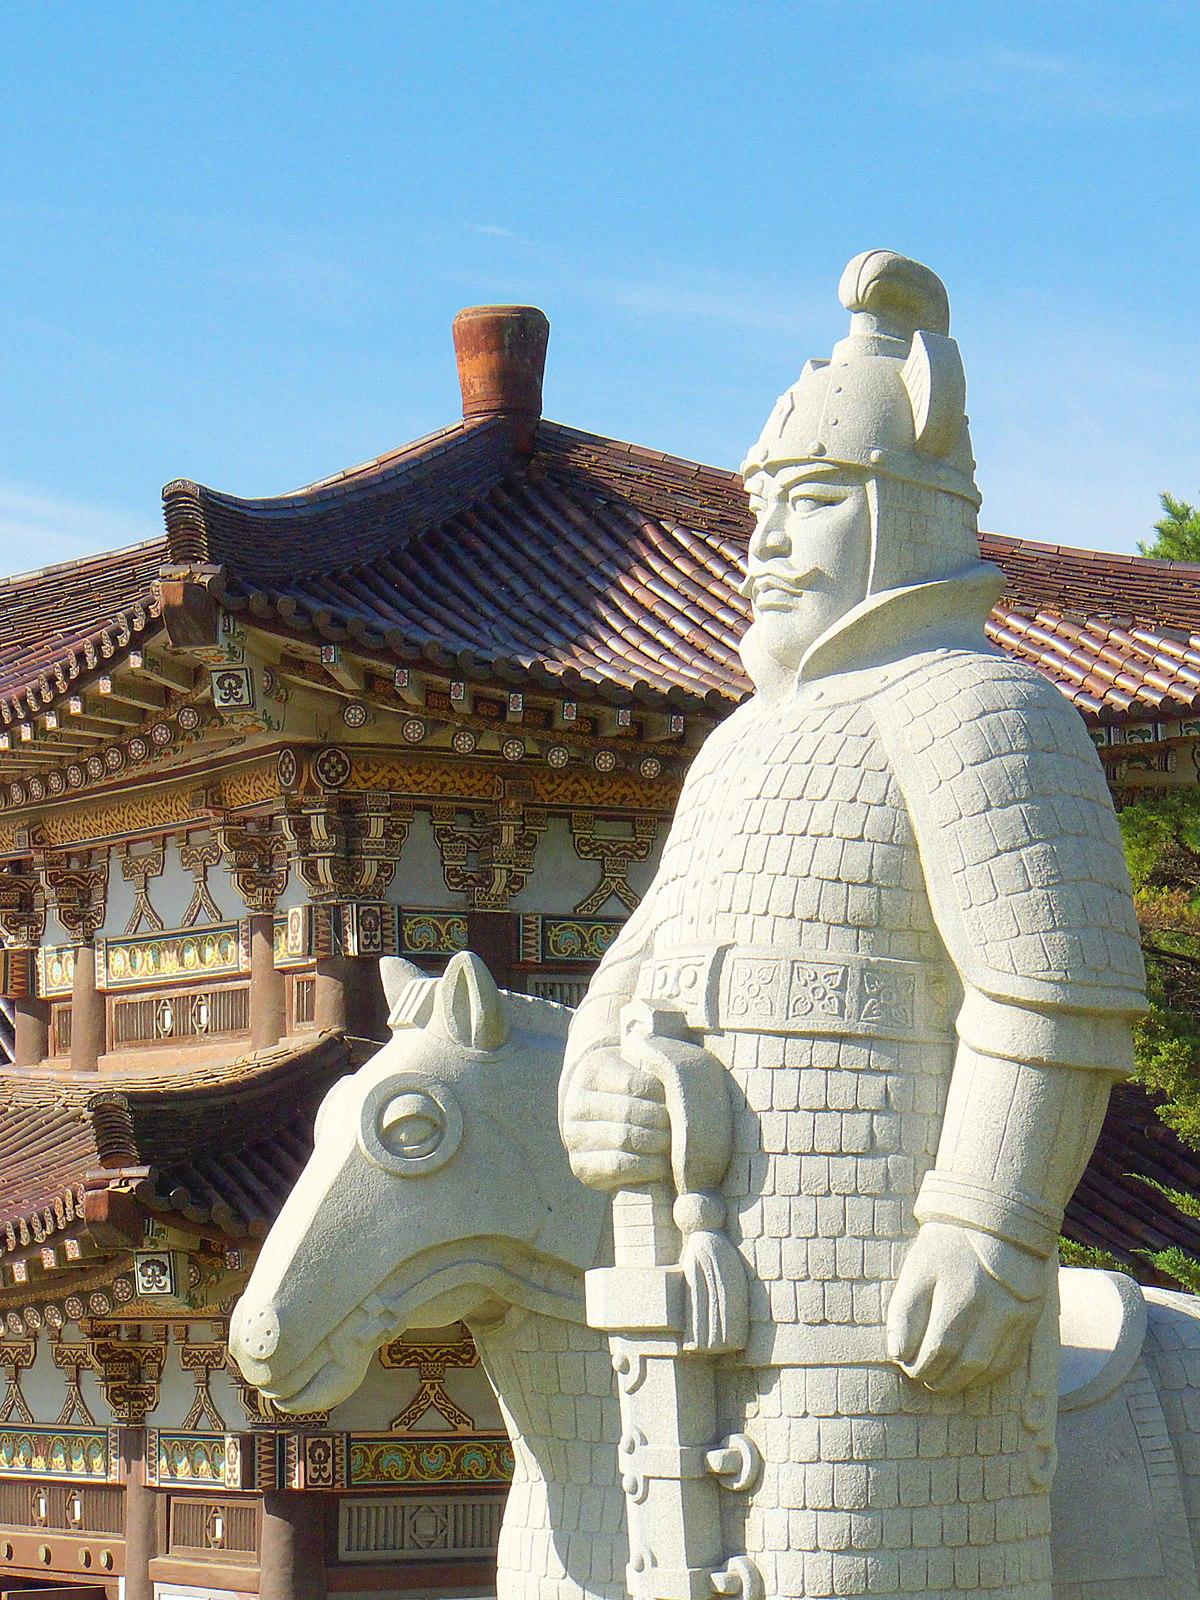 Dongmyeong of Goguryeo - Wikipedia